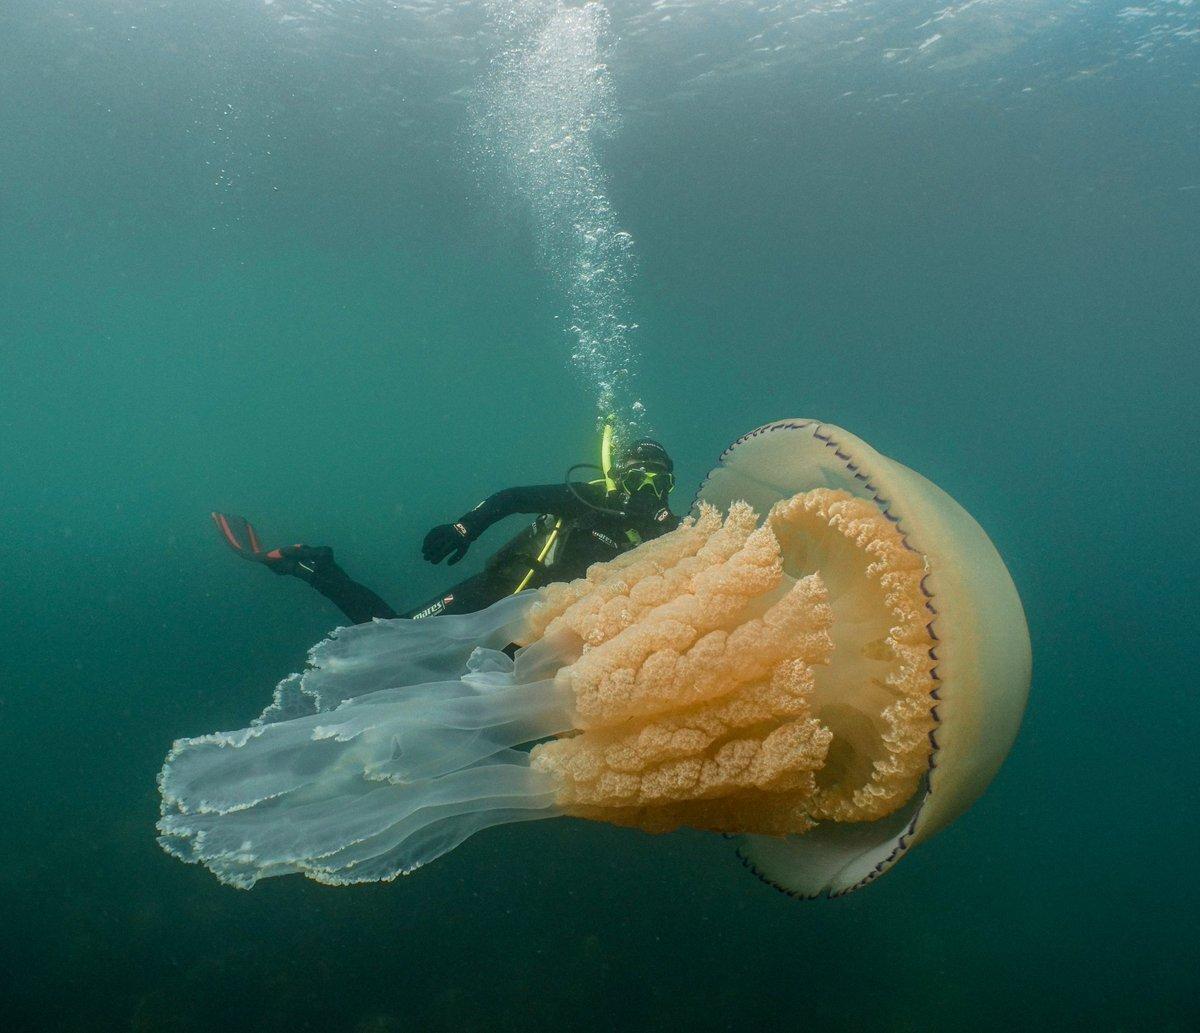 Wildlife Biologist Spots Giant Jellyfish The ...